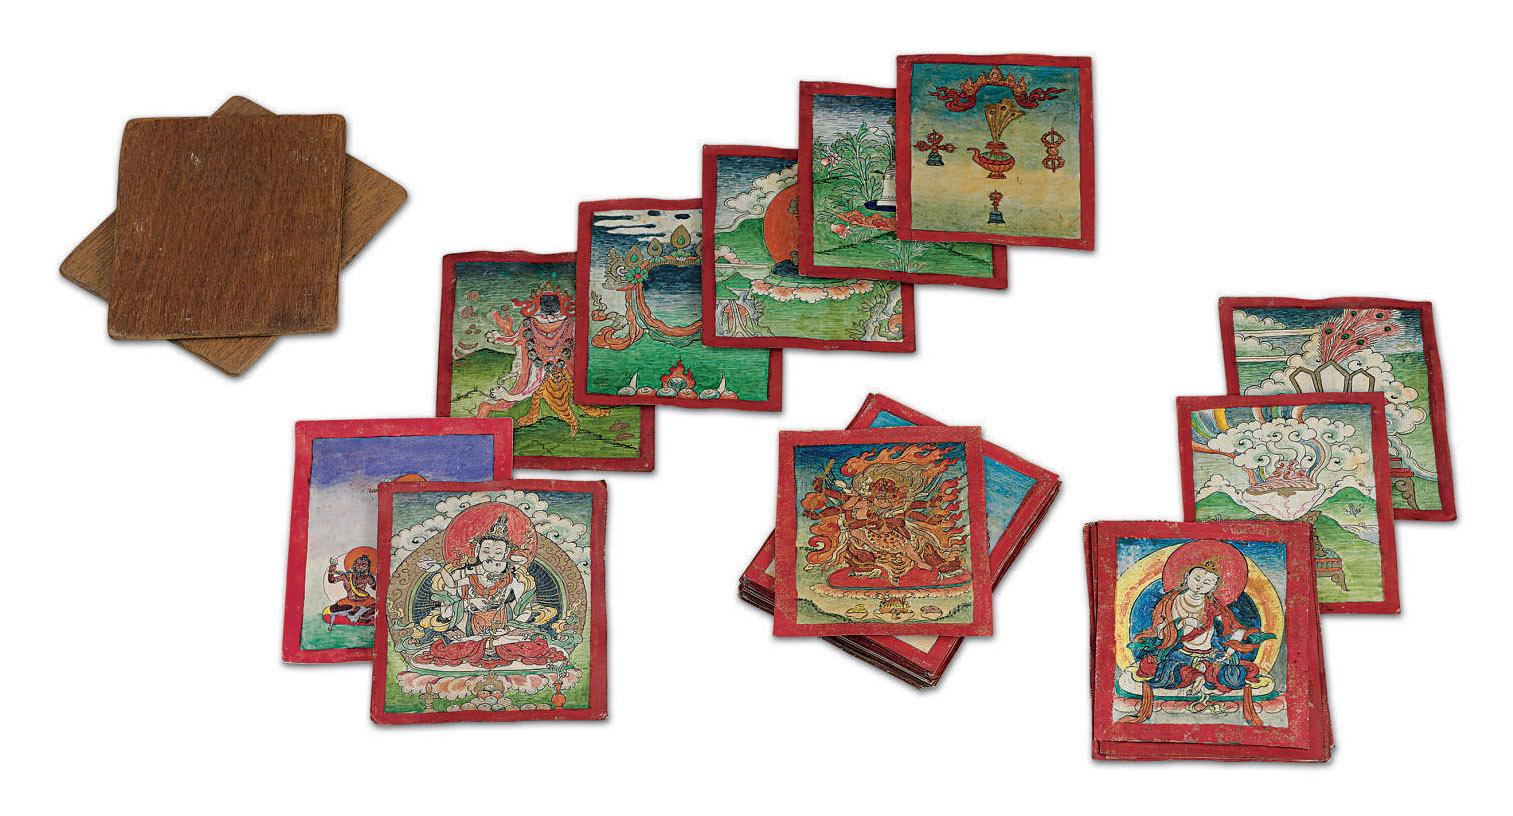 A set of tsakali